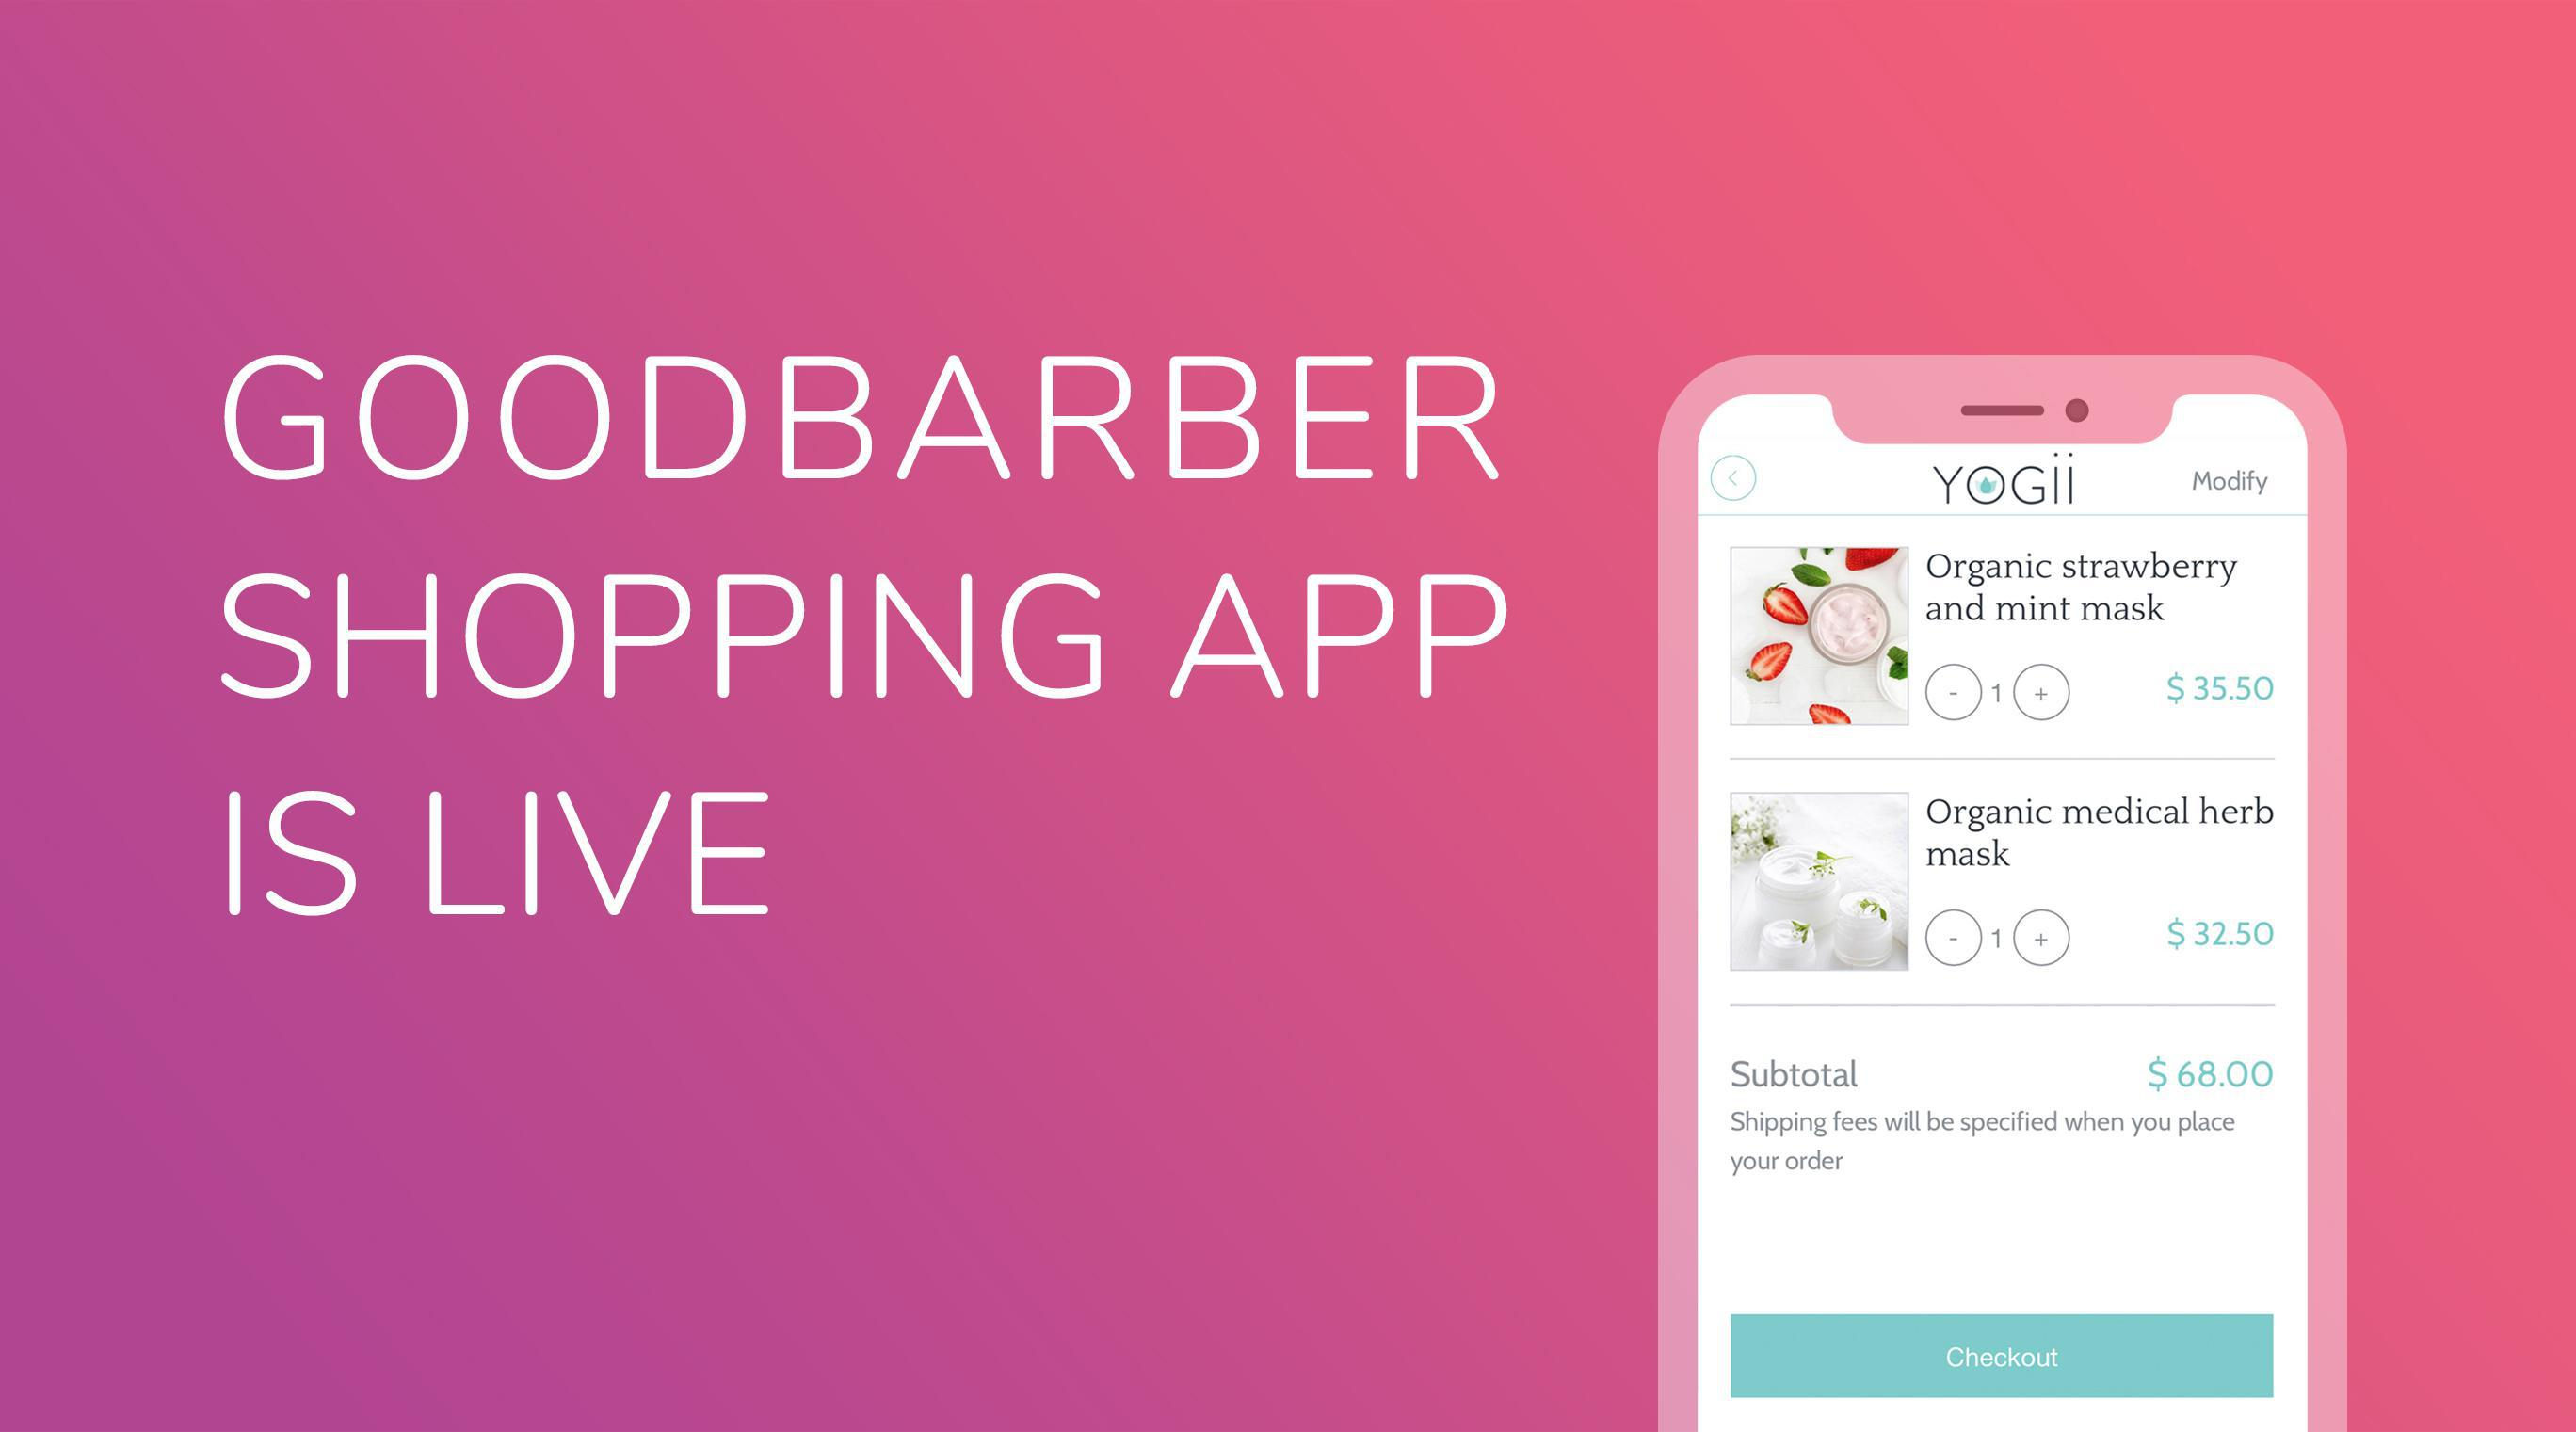 È arrivata l'app per lo shopping di GoodBarber!